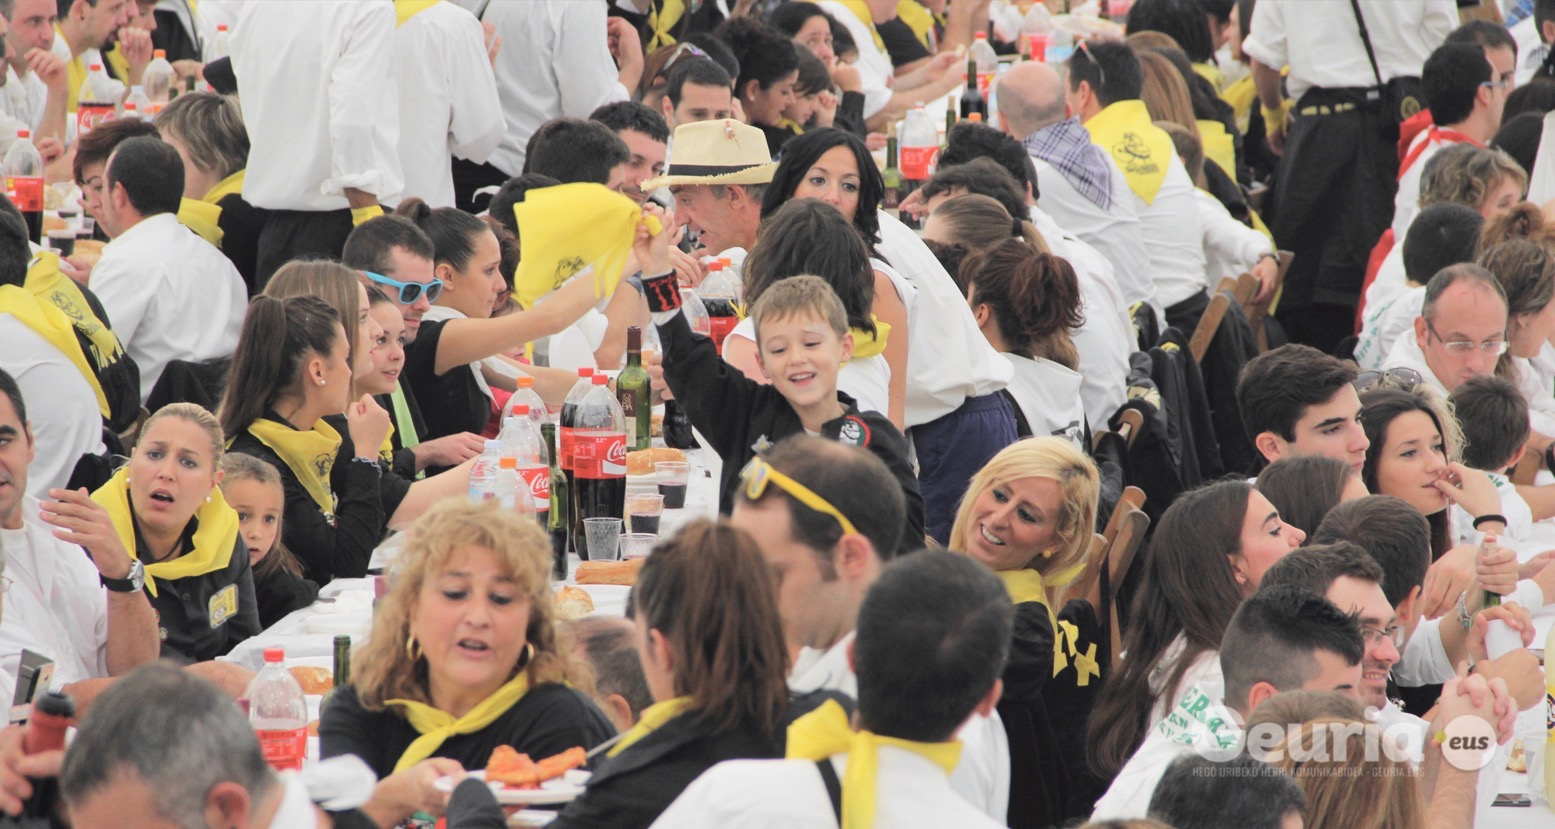 basauri_san_fausto_2015_comida_cuadrilla_6